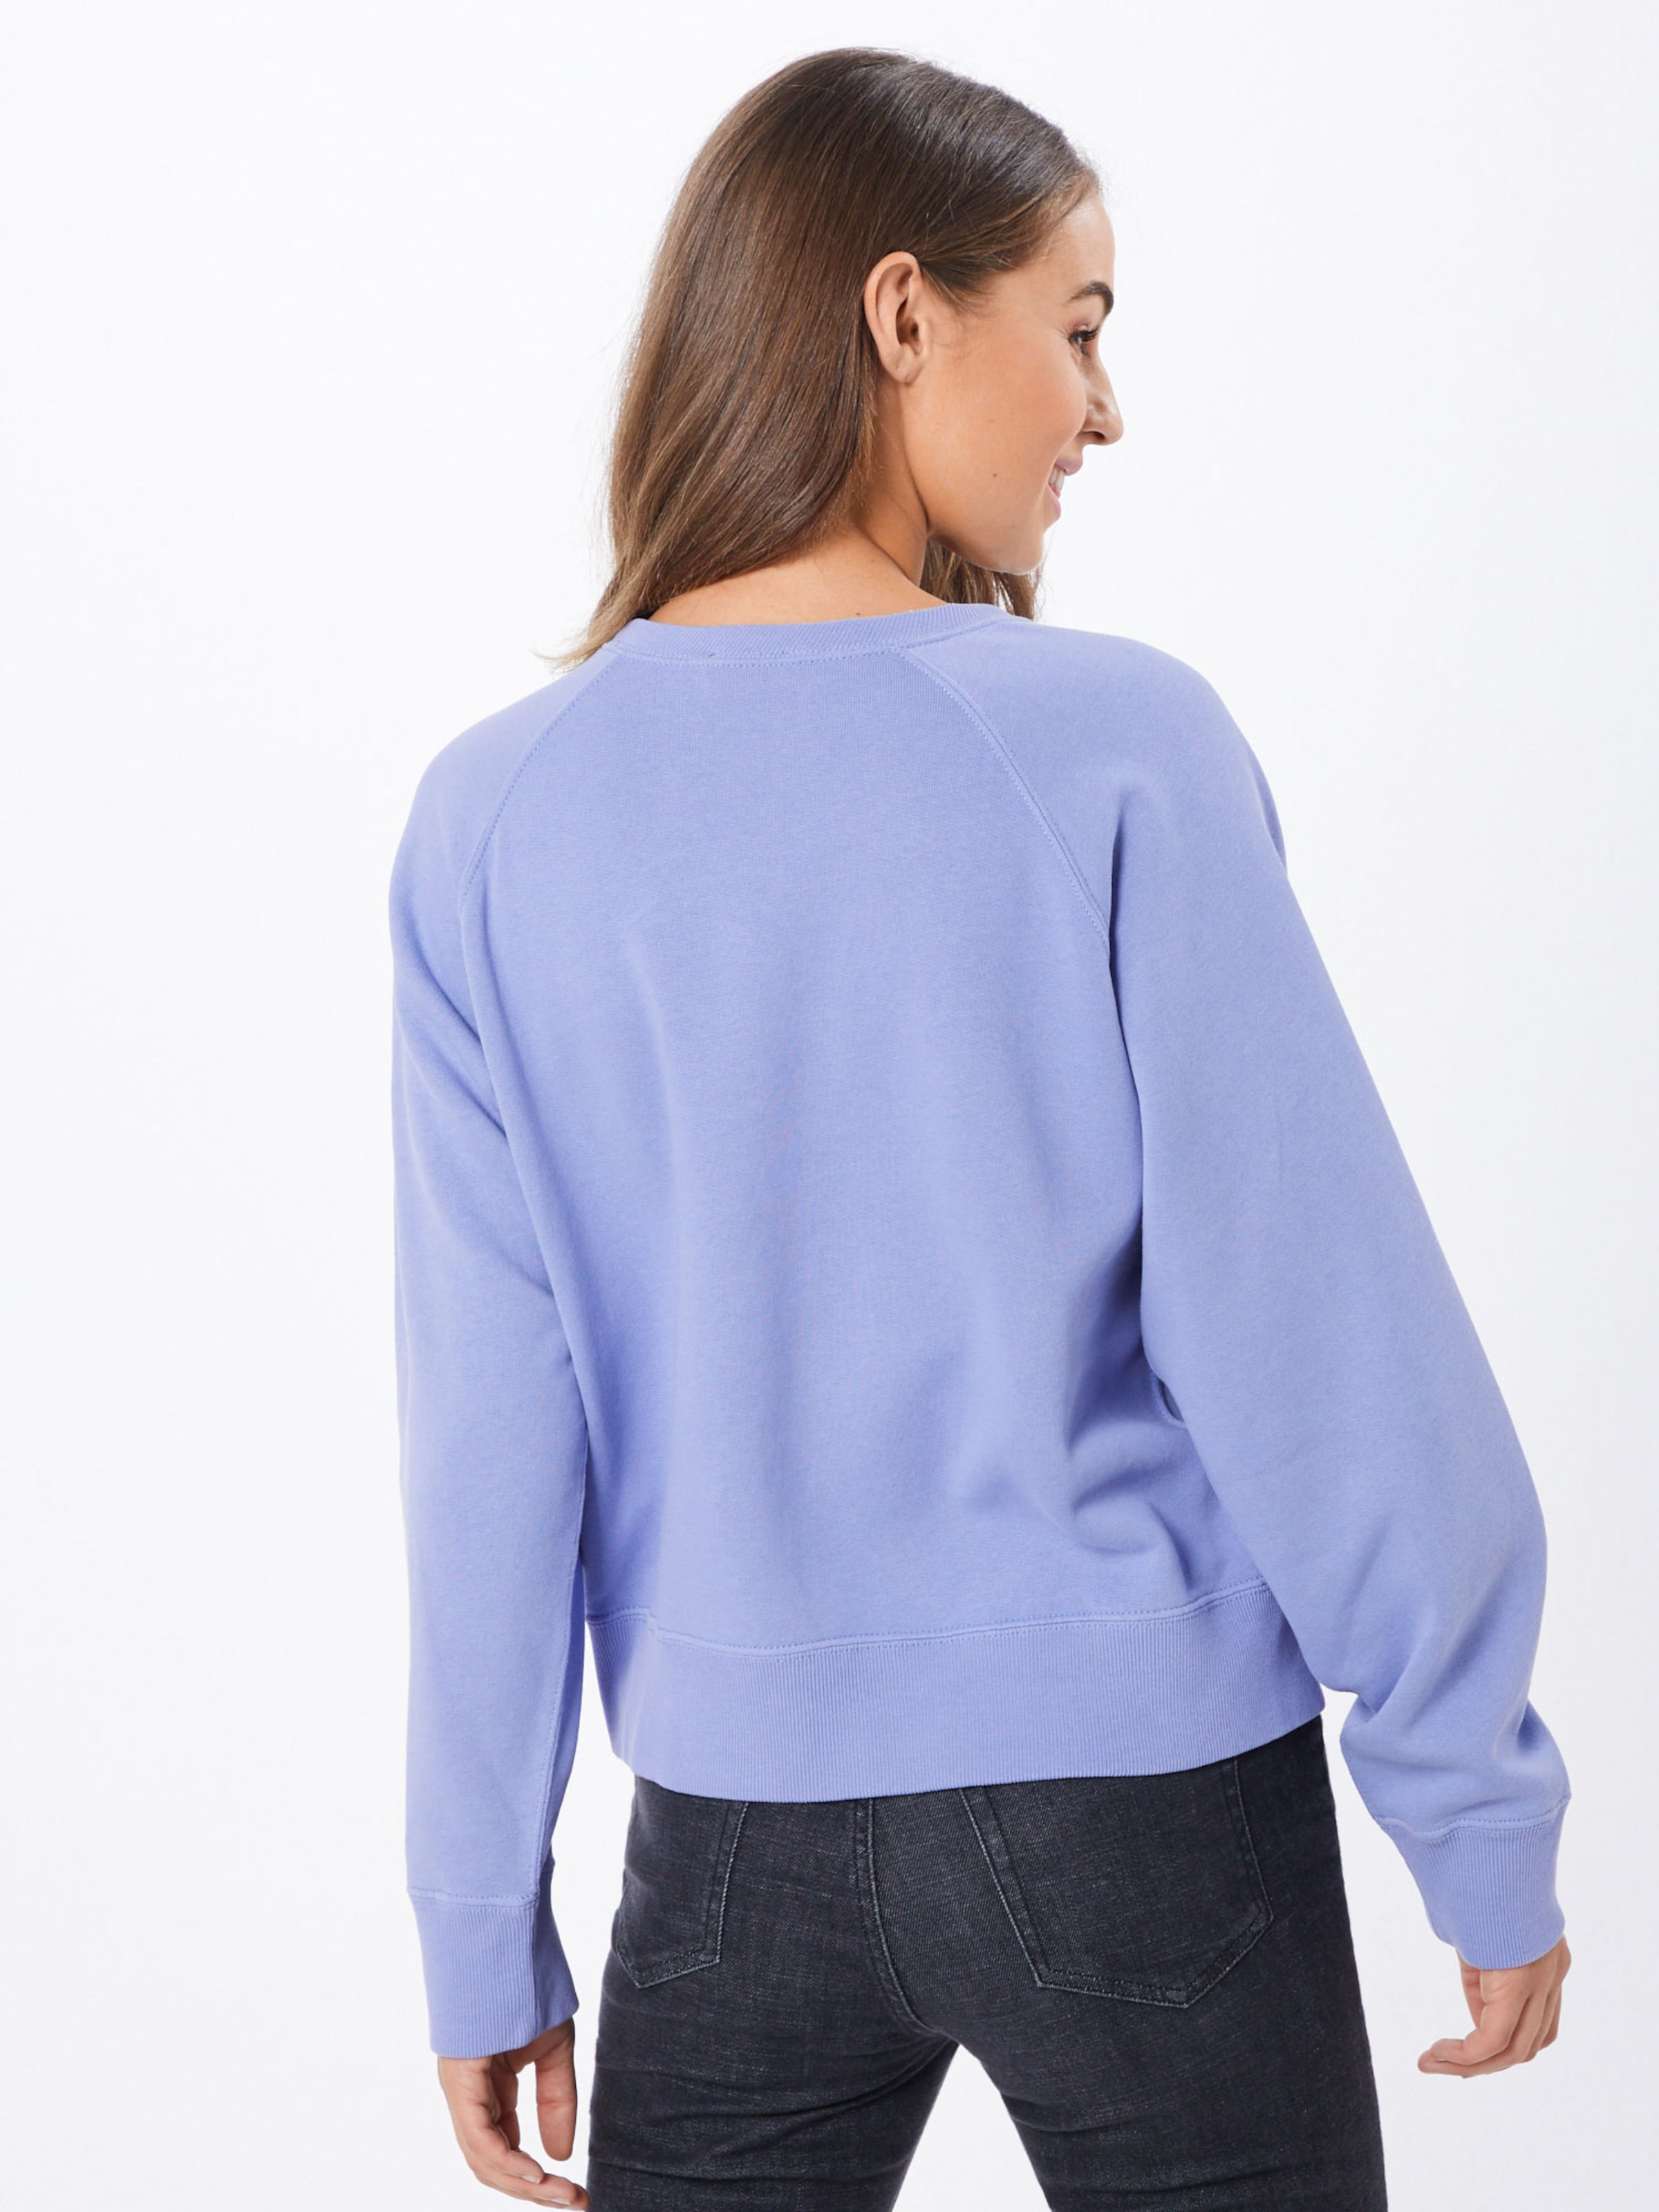 Sweat shirt JauneLilas Ralph En Polo Lauren IYb67vfgym